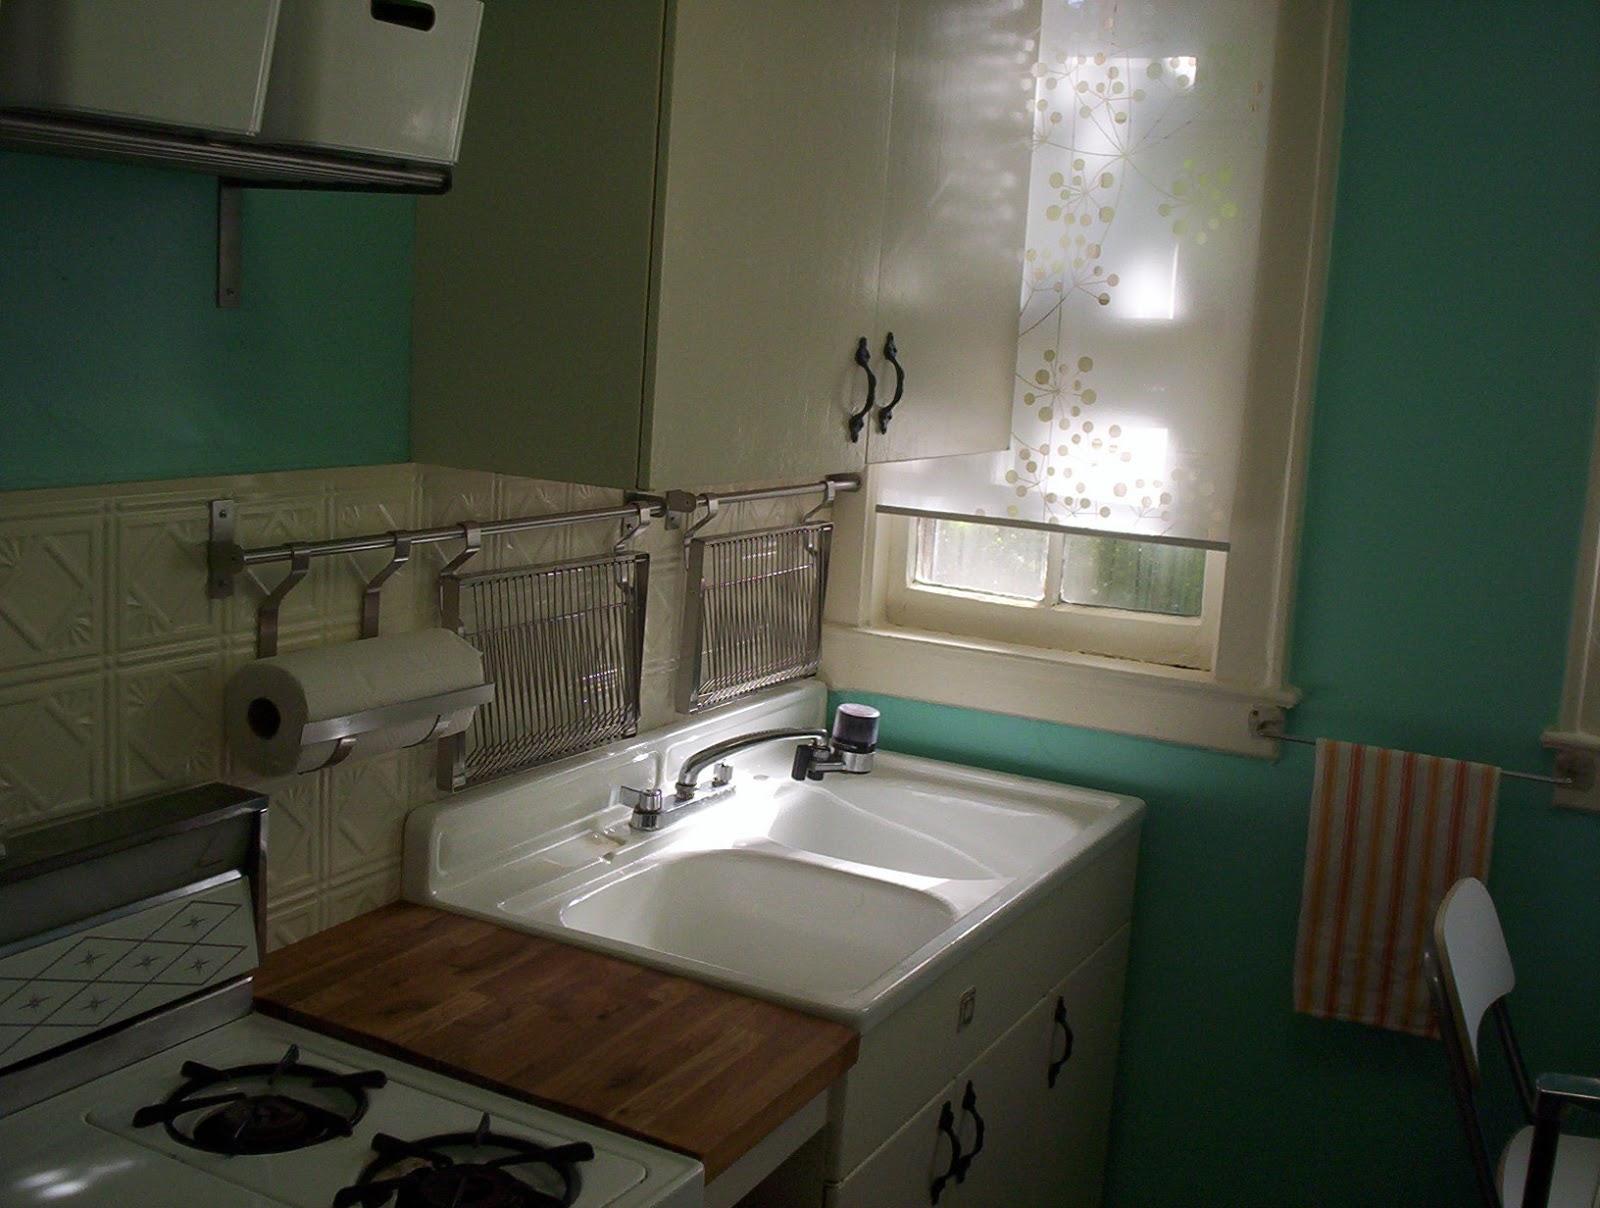 Retro Kitchen Renovation 000 1468jpg